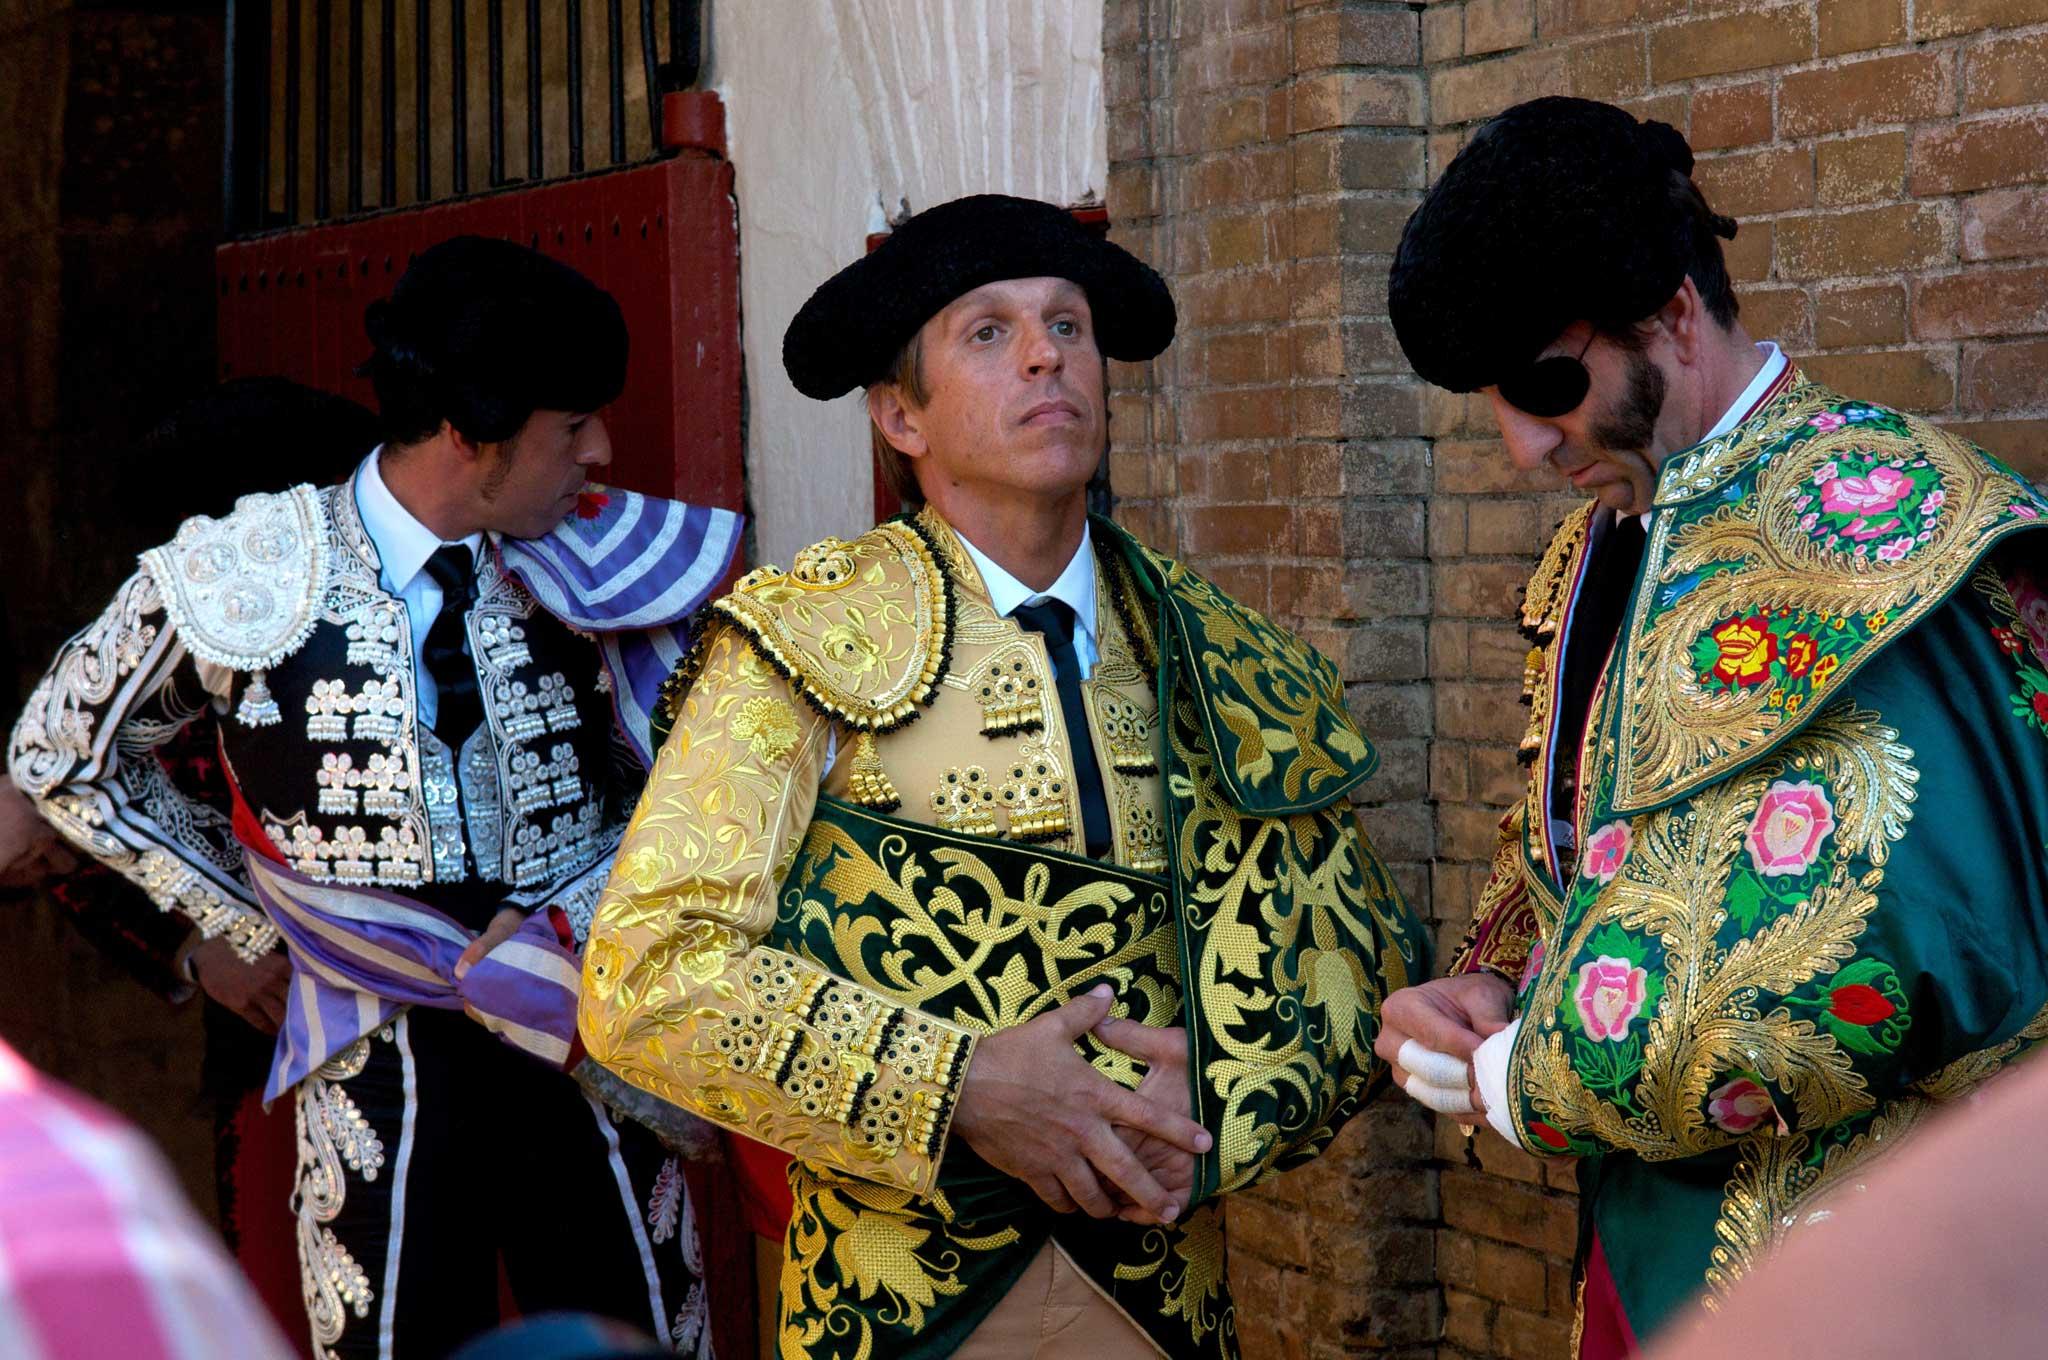 Will bullfighting survive in modern Spain?  sc 1 st  The Independent & Will bullfighting survive in modern Spain? | The Independent